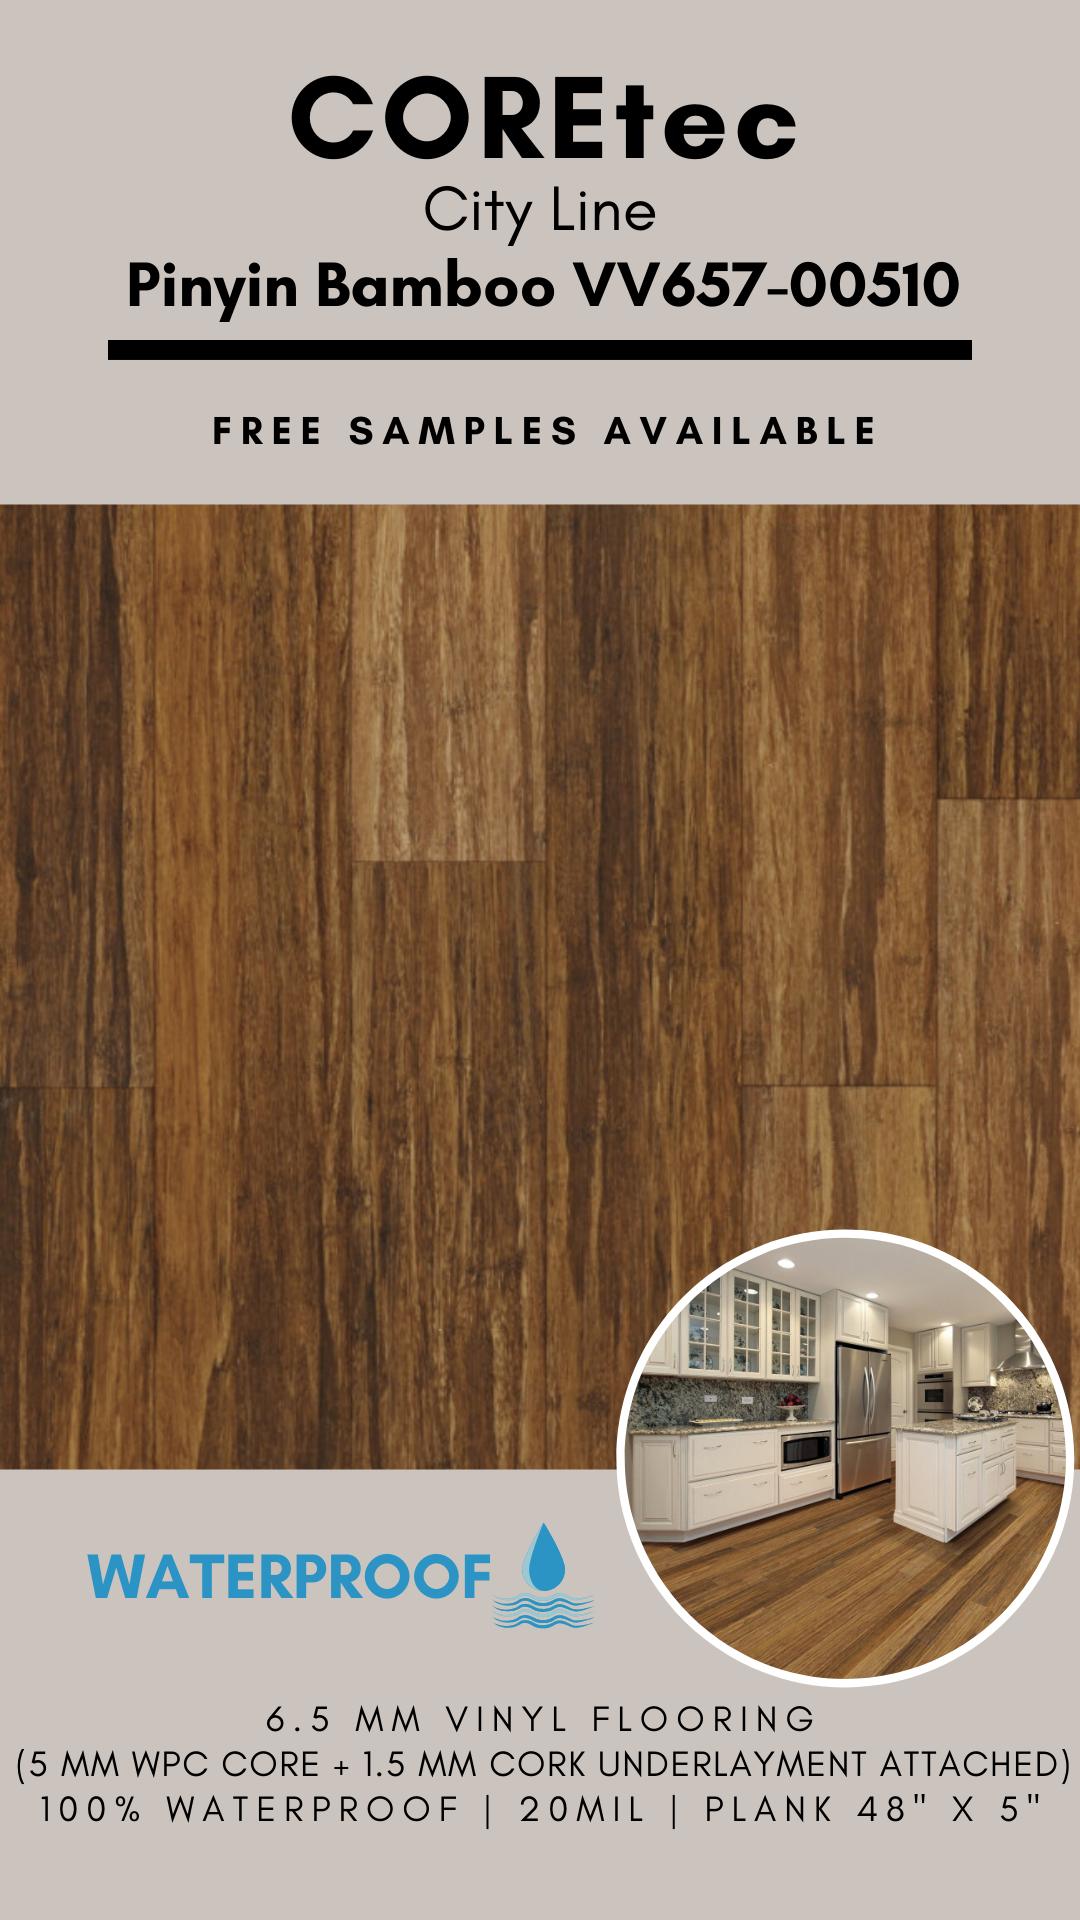 Coretec Plus 5 Wpc City Line Plank Pinyin Bamboo Vv657 00510 Vinyl Flooring Special Buy In 2020 Vinyl Flooring Flooring Coretec Plus Flooring